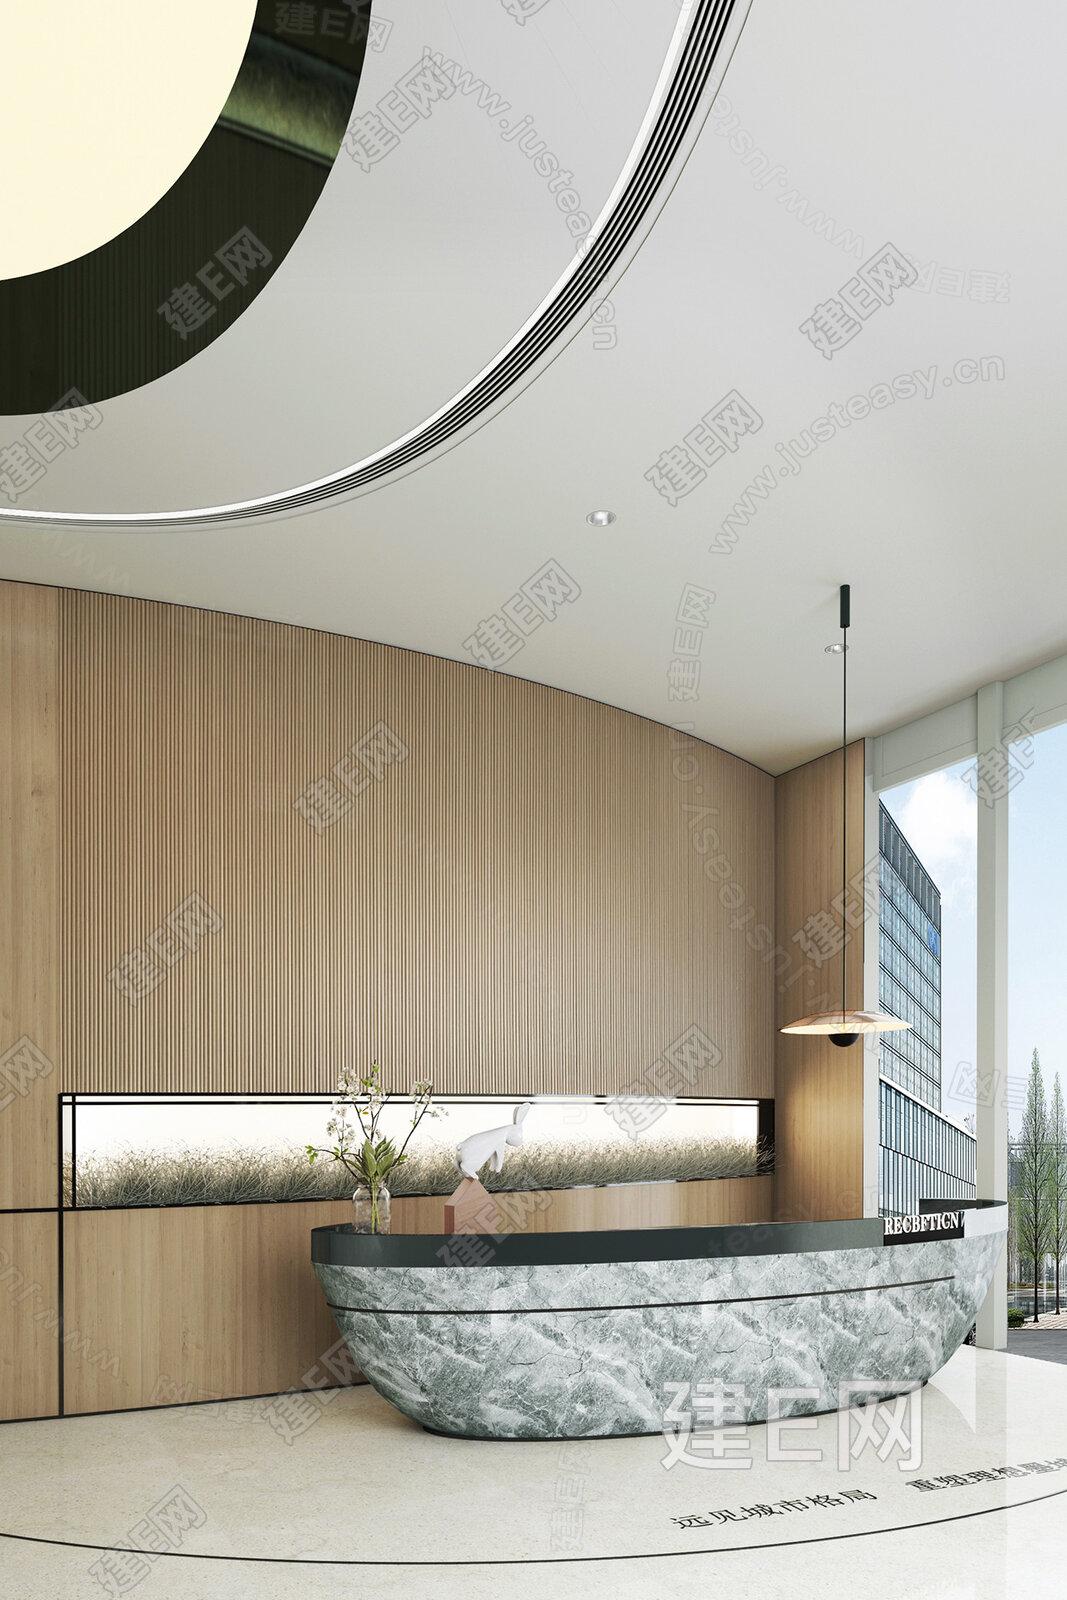 MOD 墨设设计 现代售楼处装饰摆件3d模型